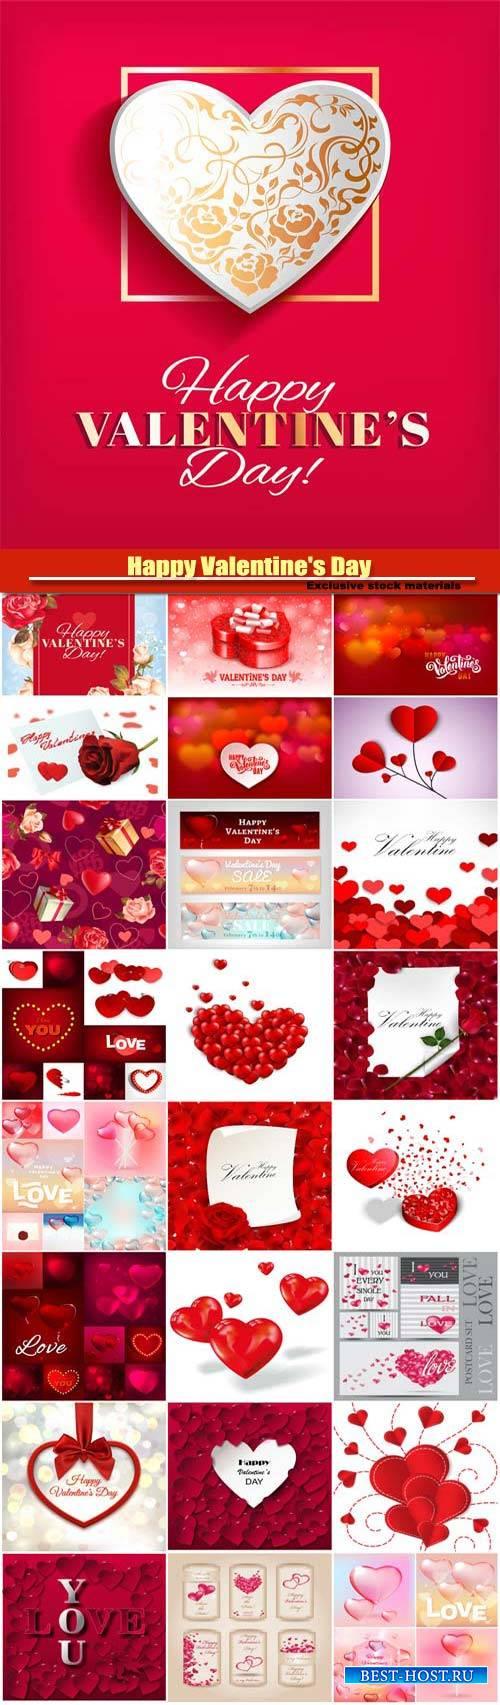 Happy Valentine's Day vector, hearts, romance, love #18